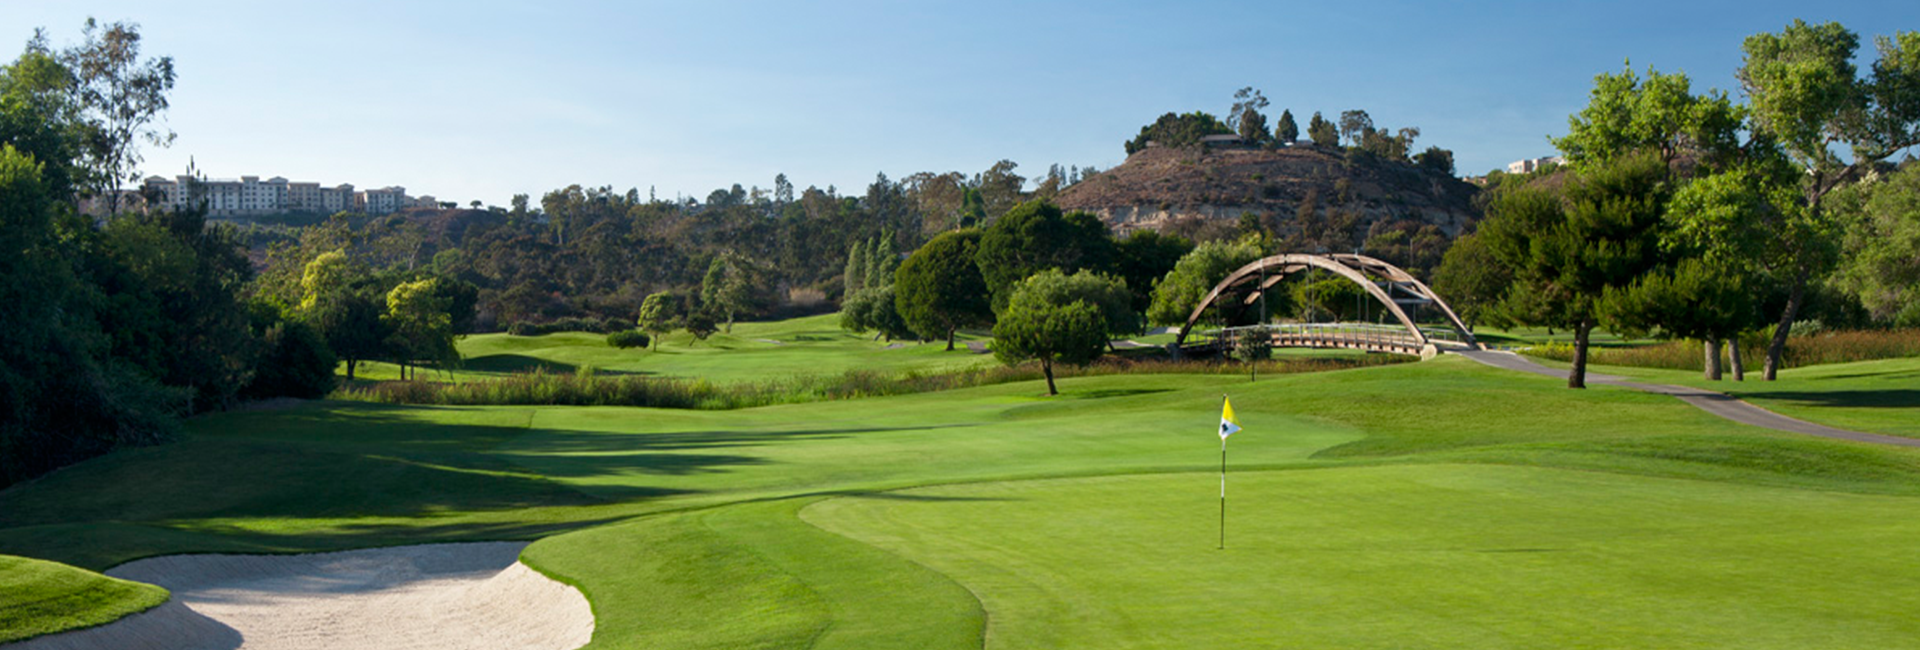 Indigo Creek, Myrtle Beach, SC | Golf Courses I\'ve Played ...